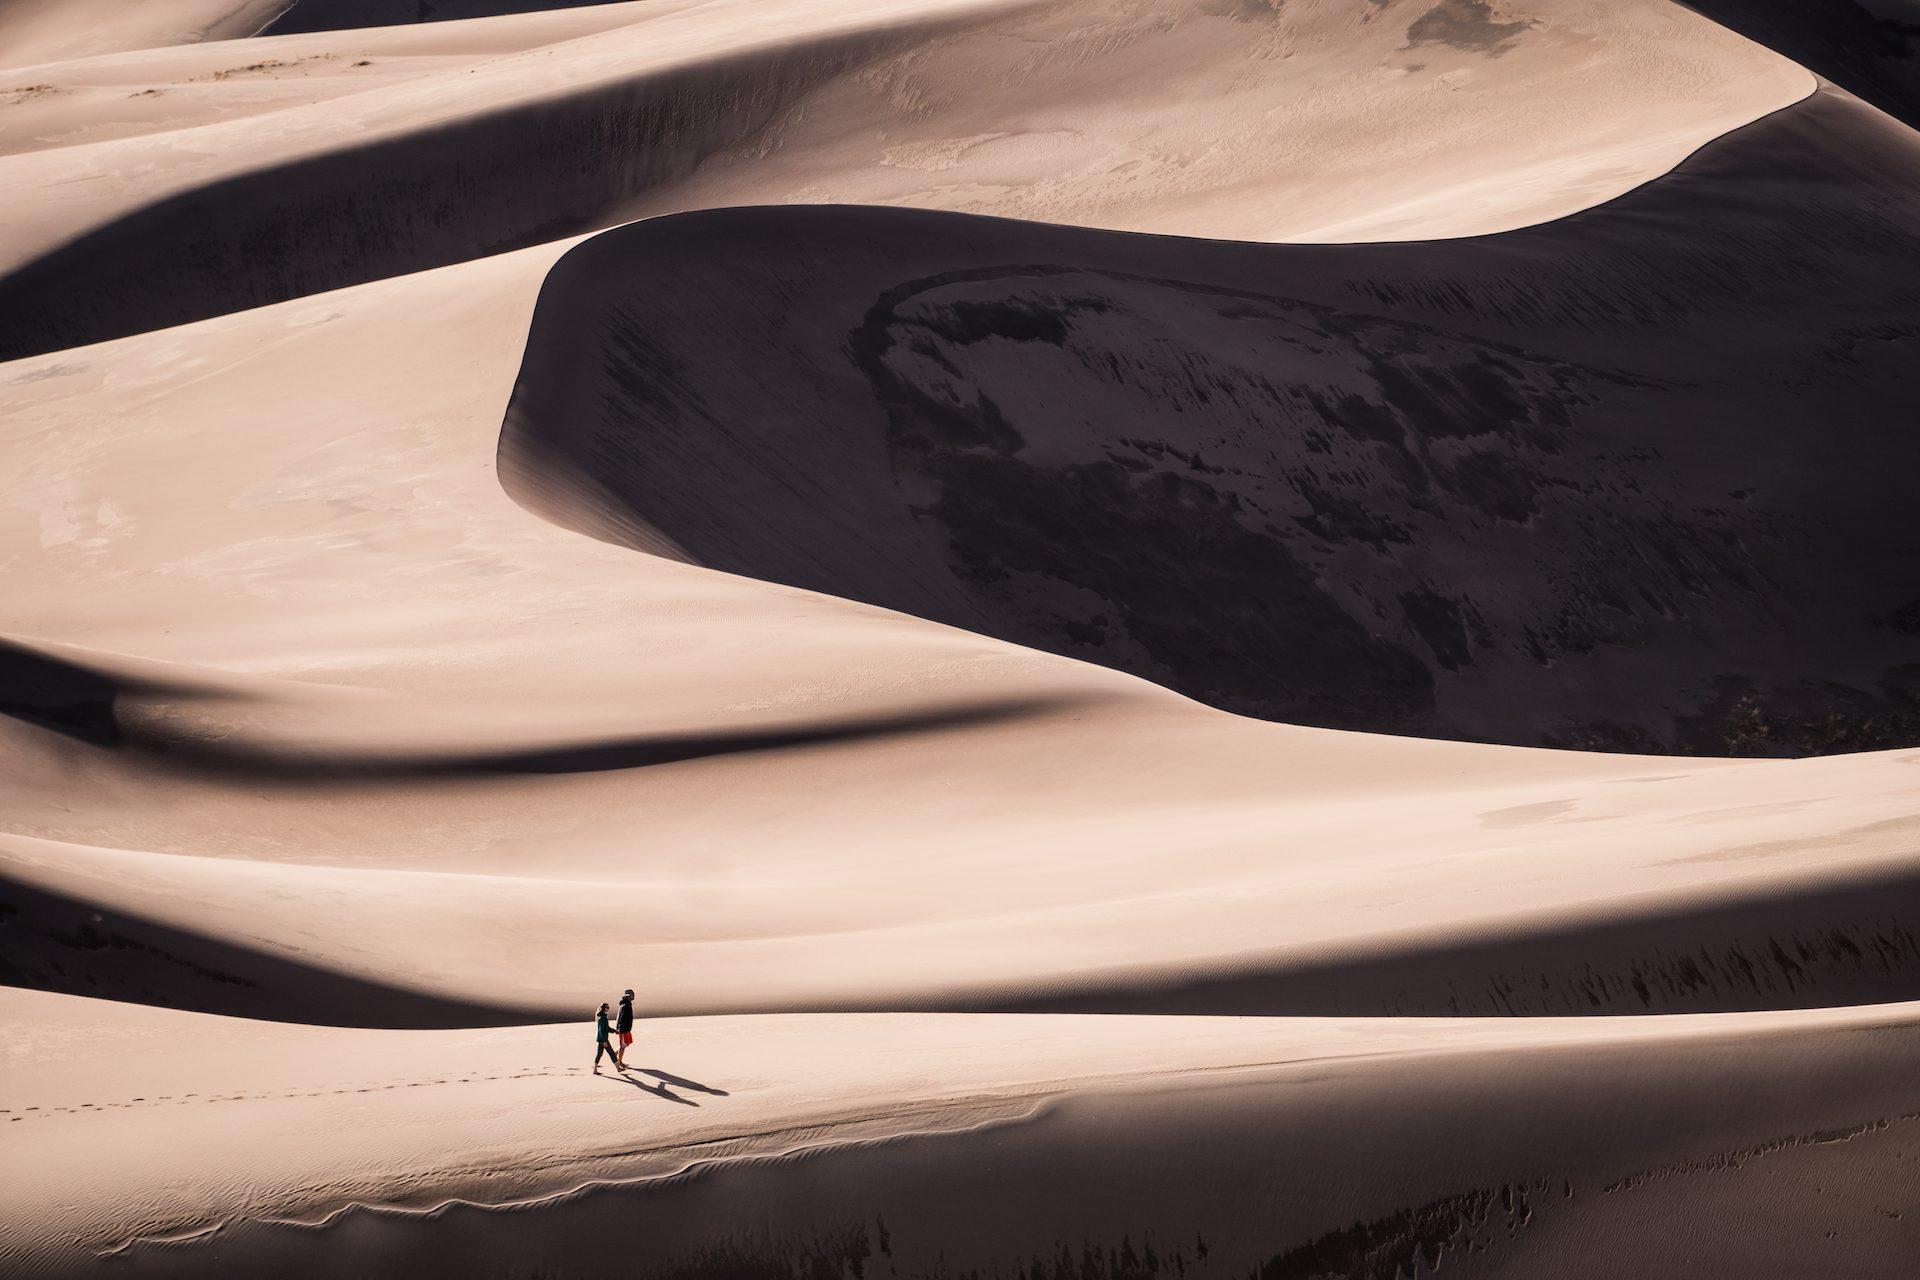 deserto, sabbia, coppia, Dune, Soledad - Sfondi HD - Professor-falken.com